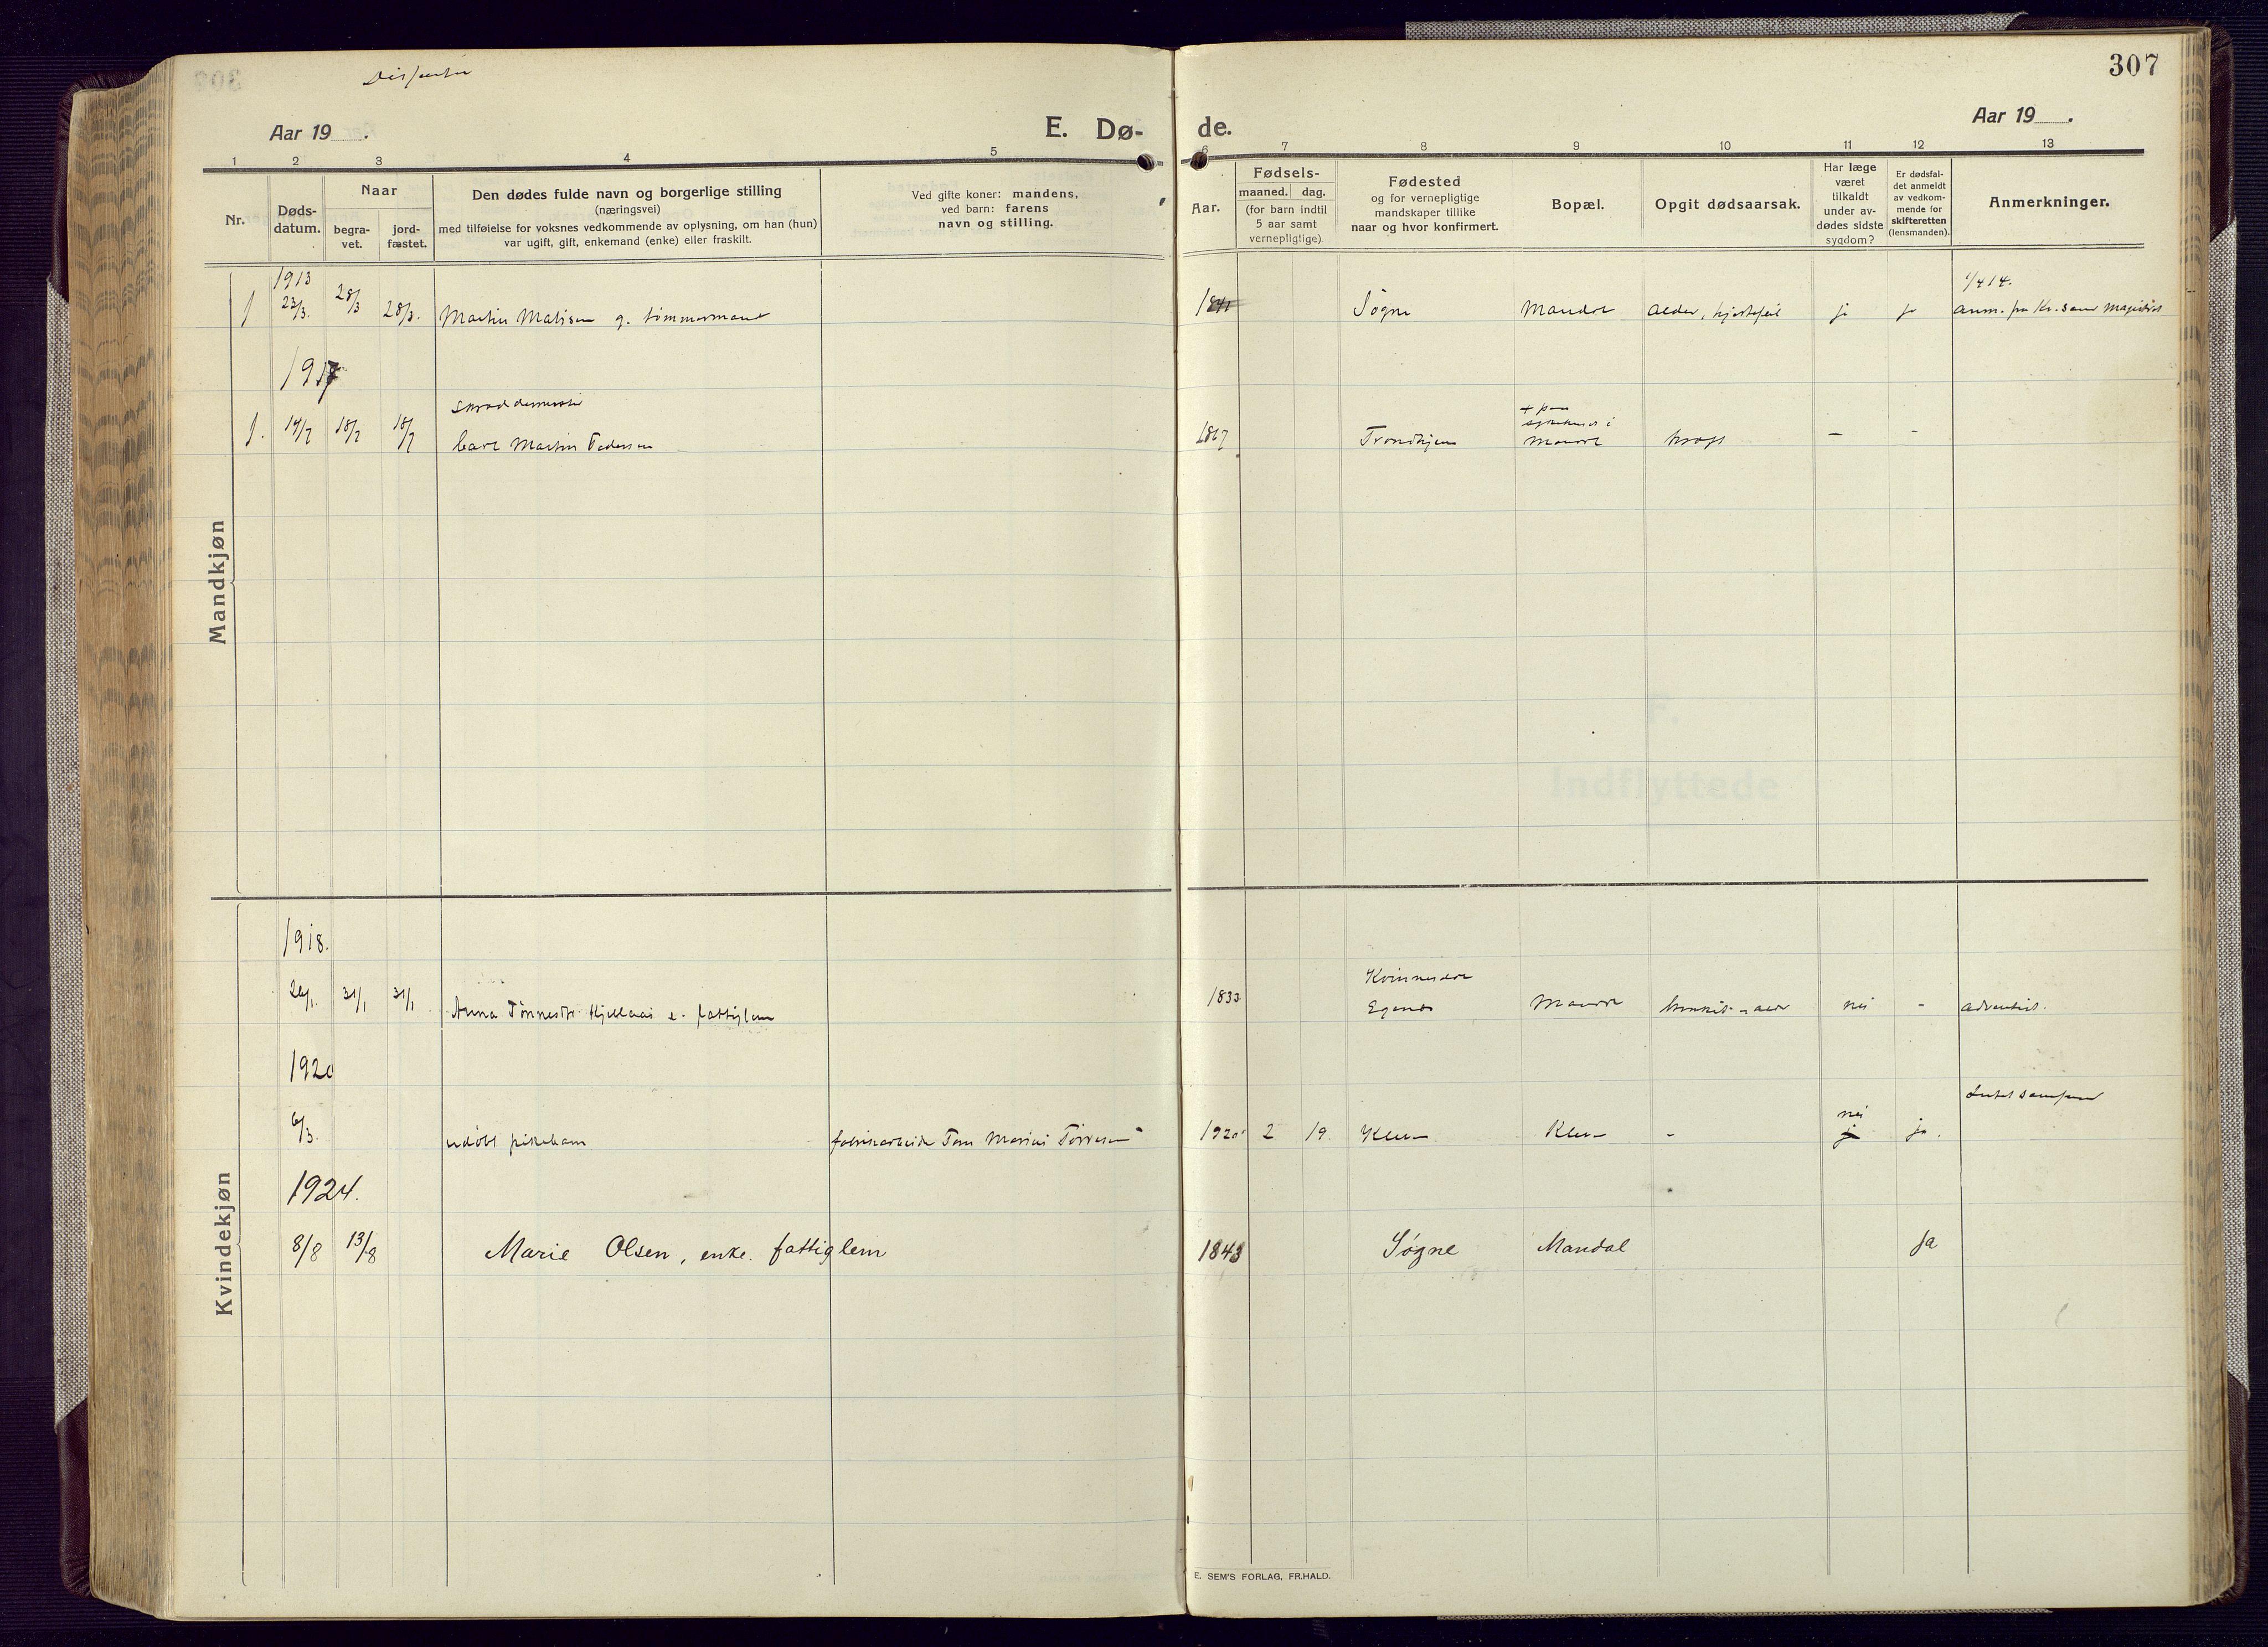 SAK, Mandal sokneprestkontor, F/Fa/Fac/L0001: Ministerialbok nr. A 1, 1913-1925, s. 307